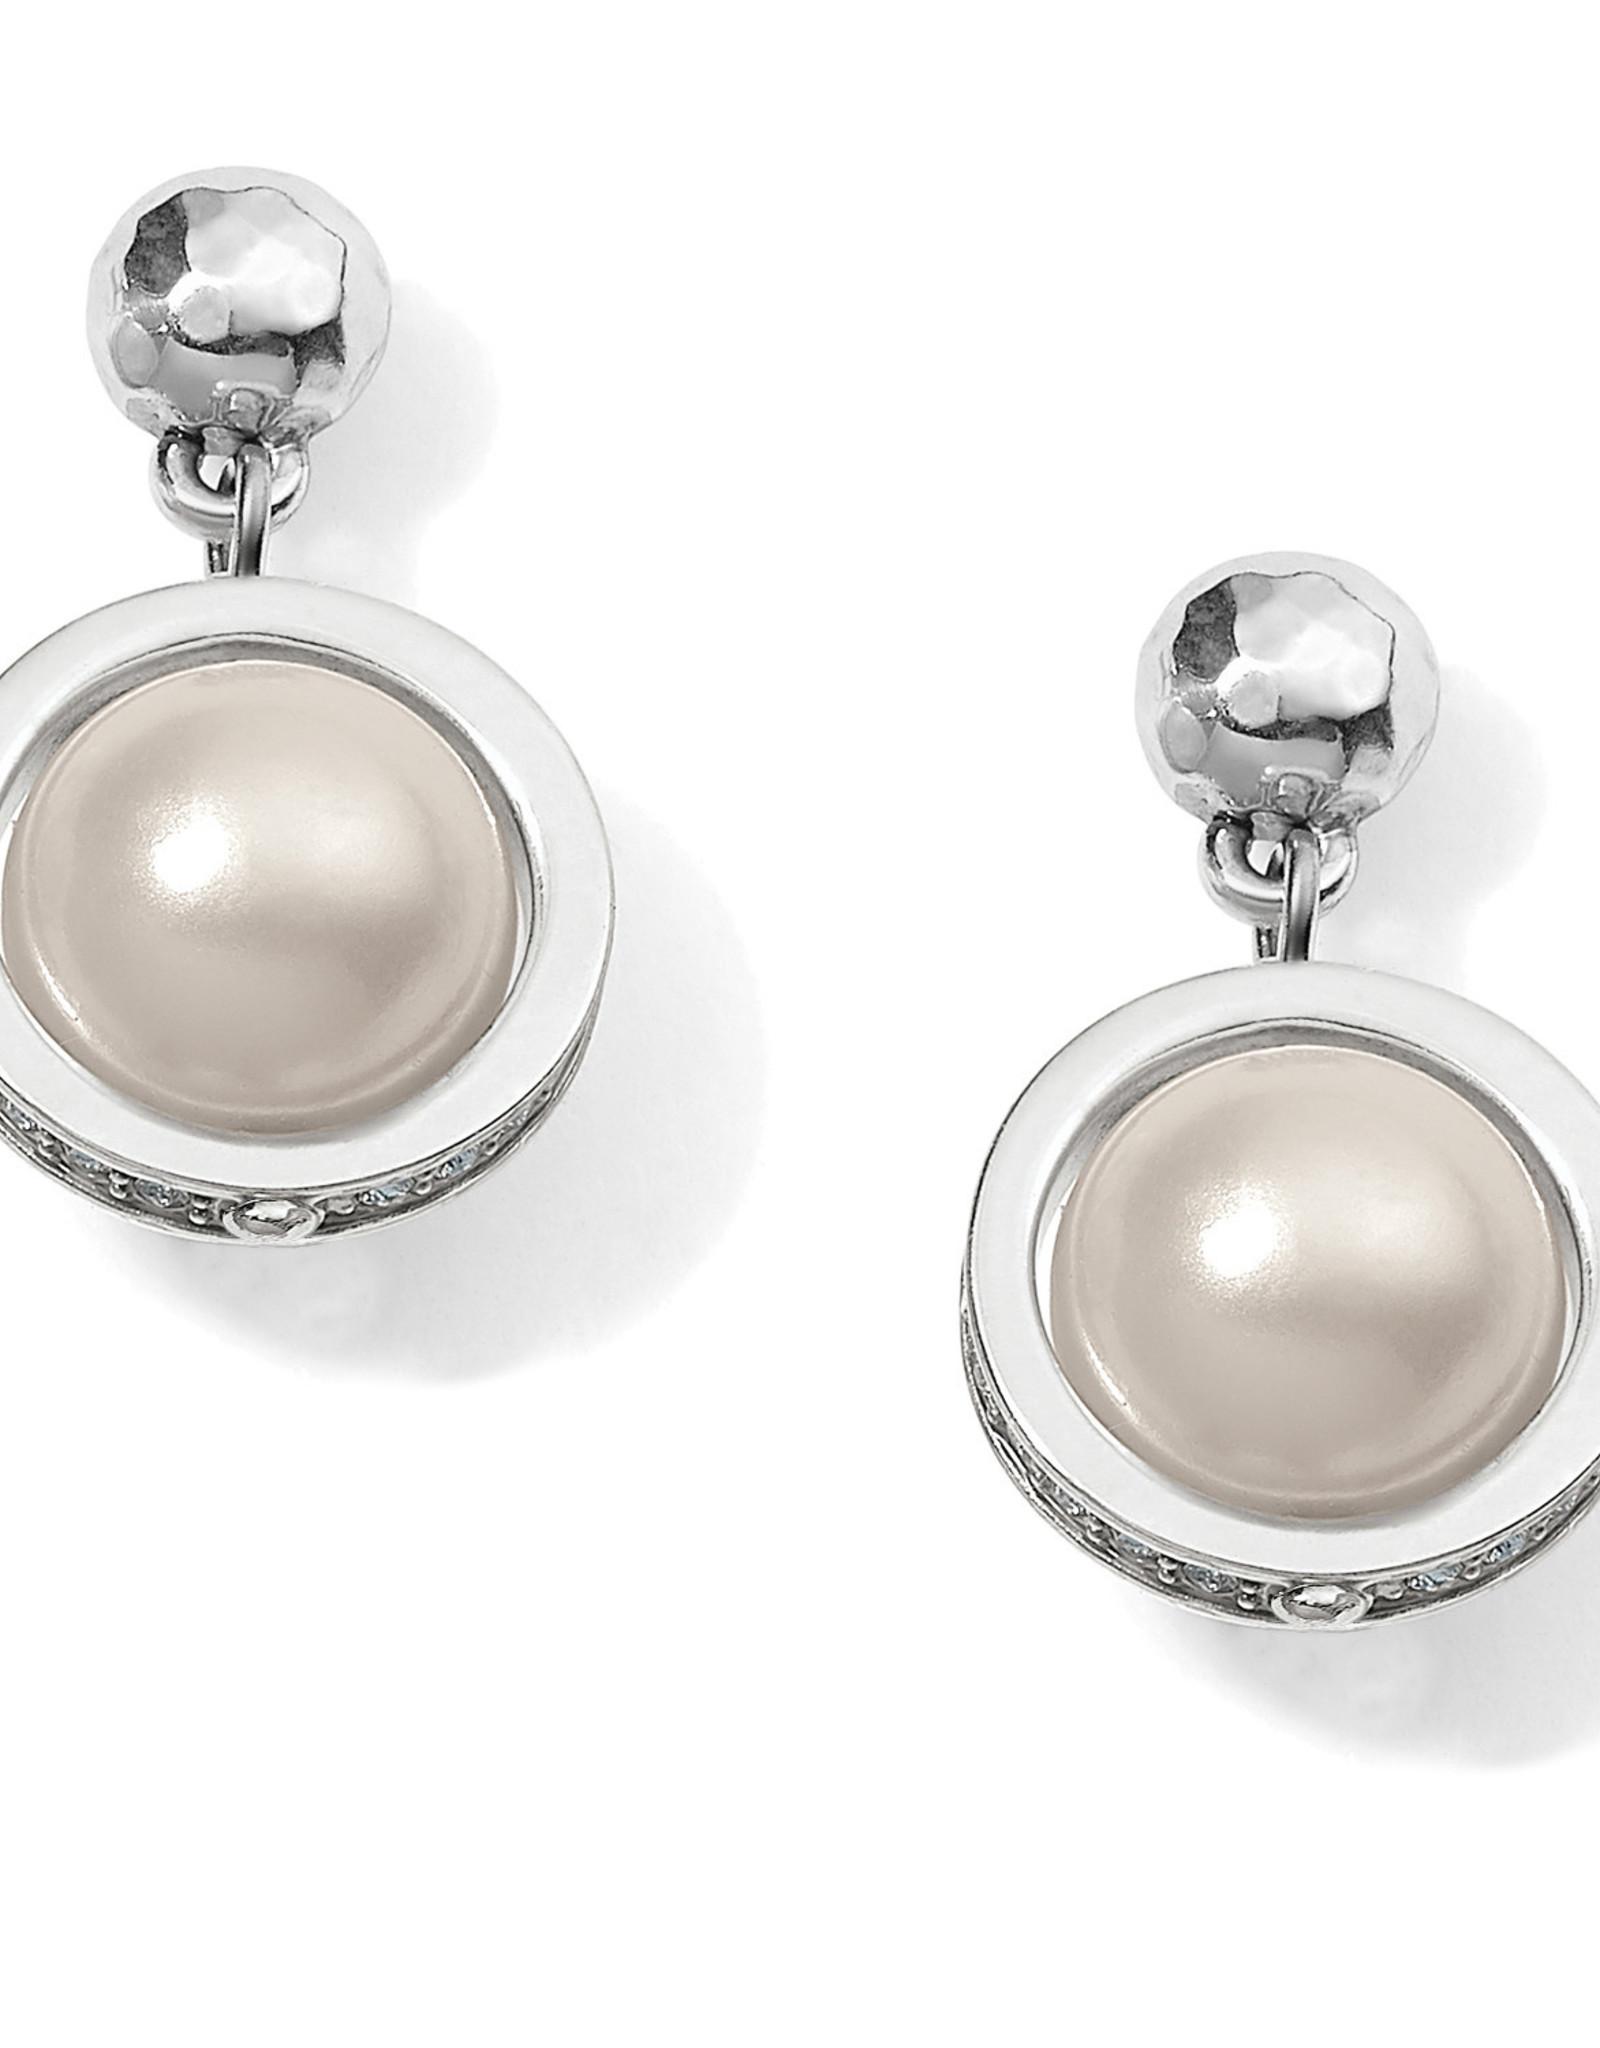 Brighton Brighton Earrings Chara Ellipse Spin Post Drop- Silver/Pearl